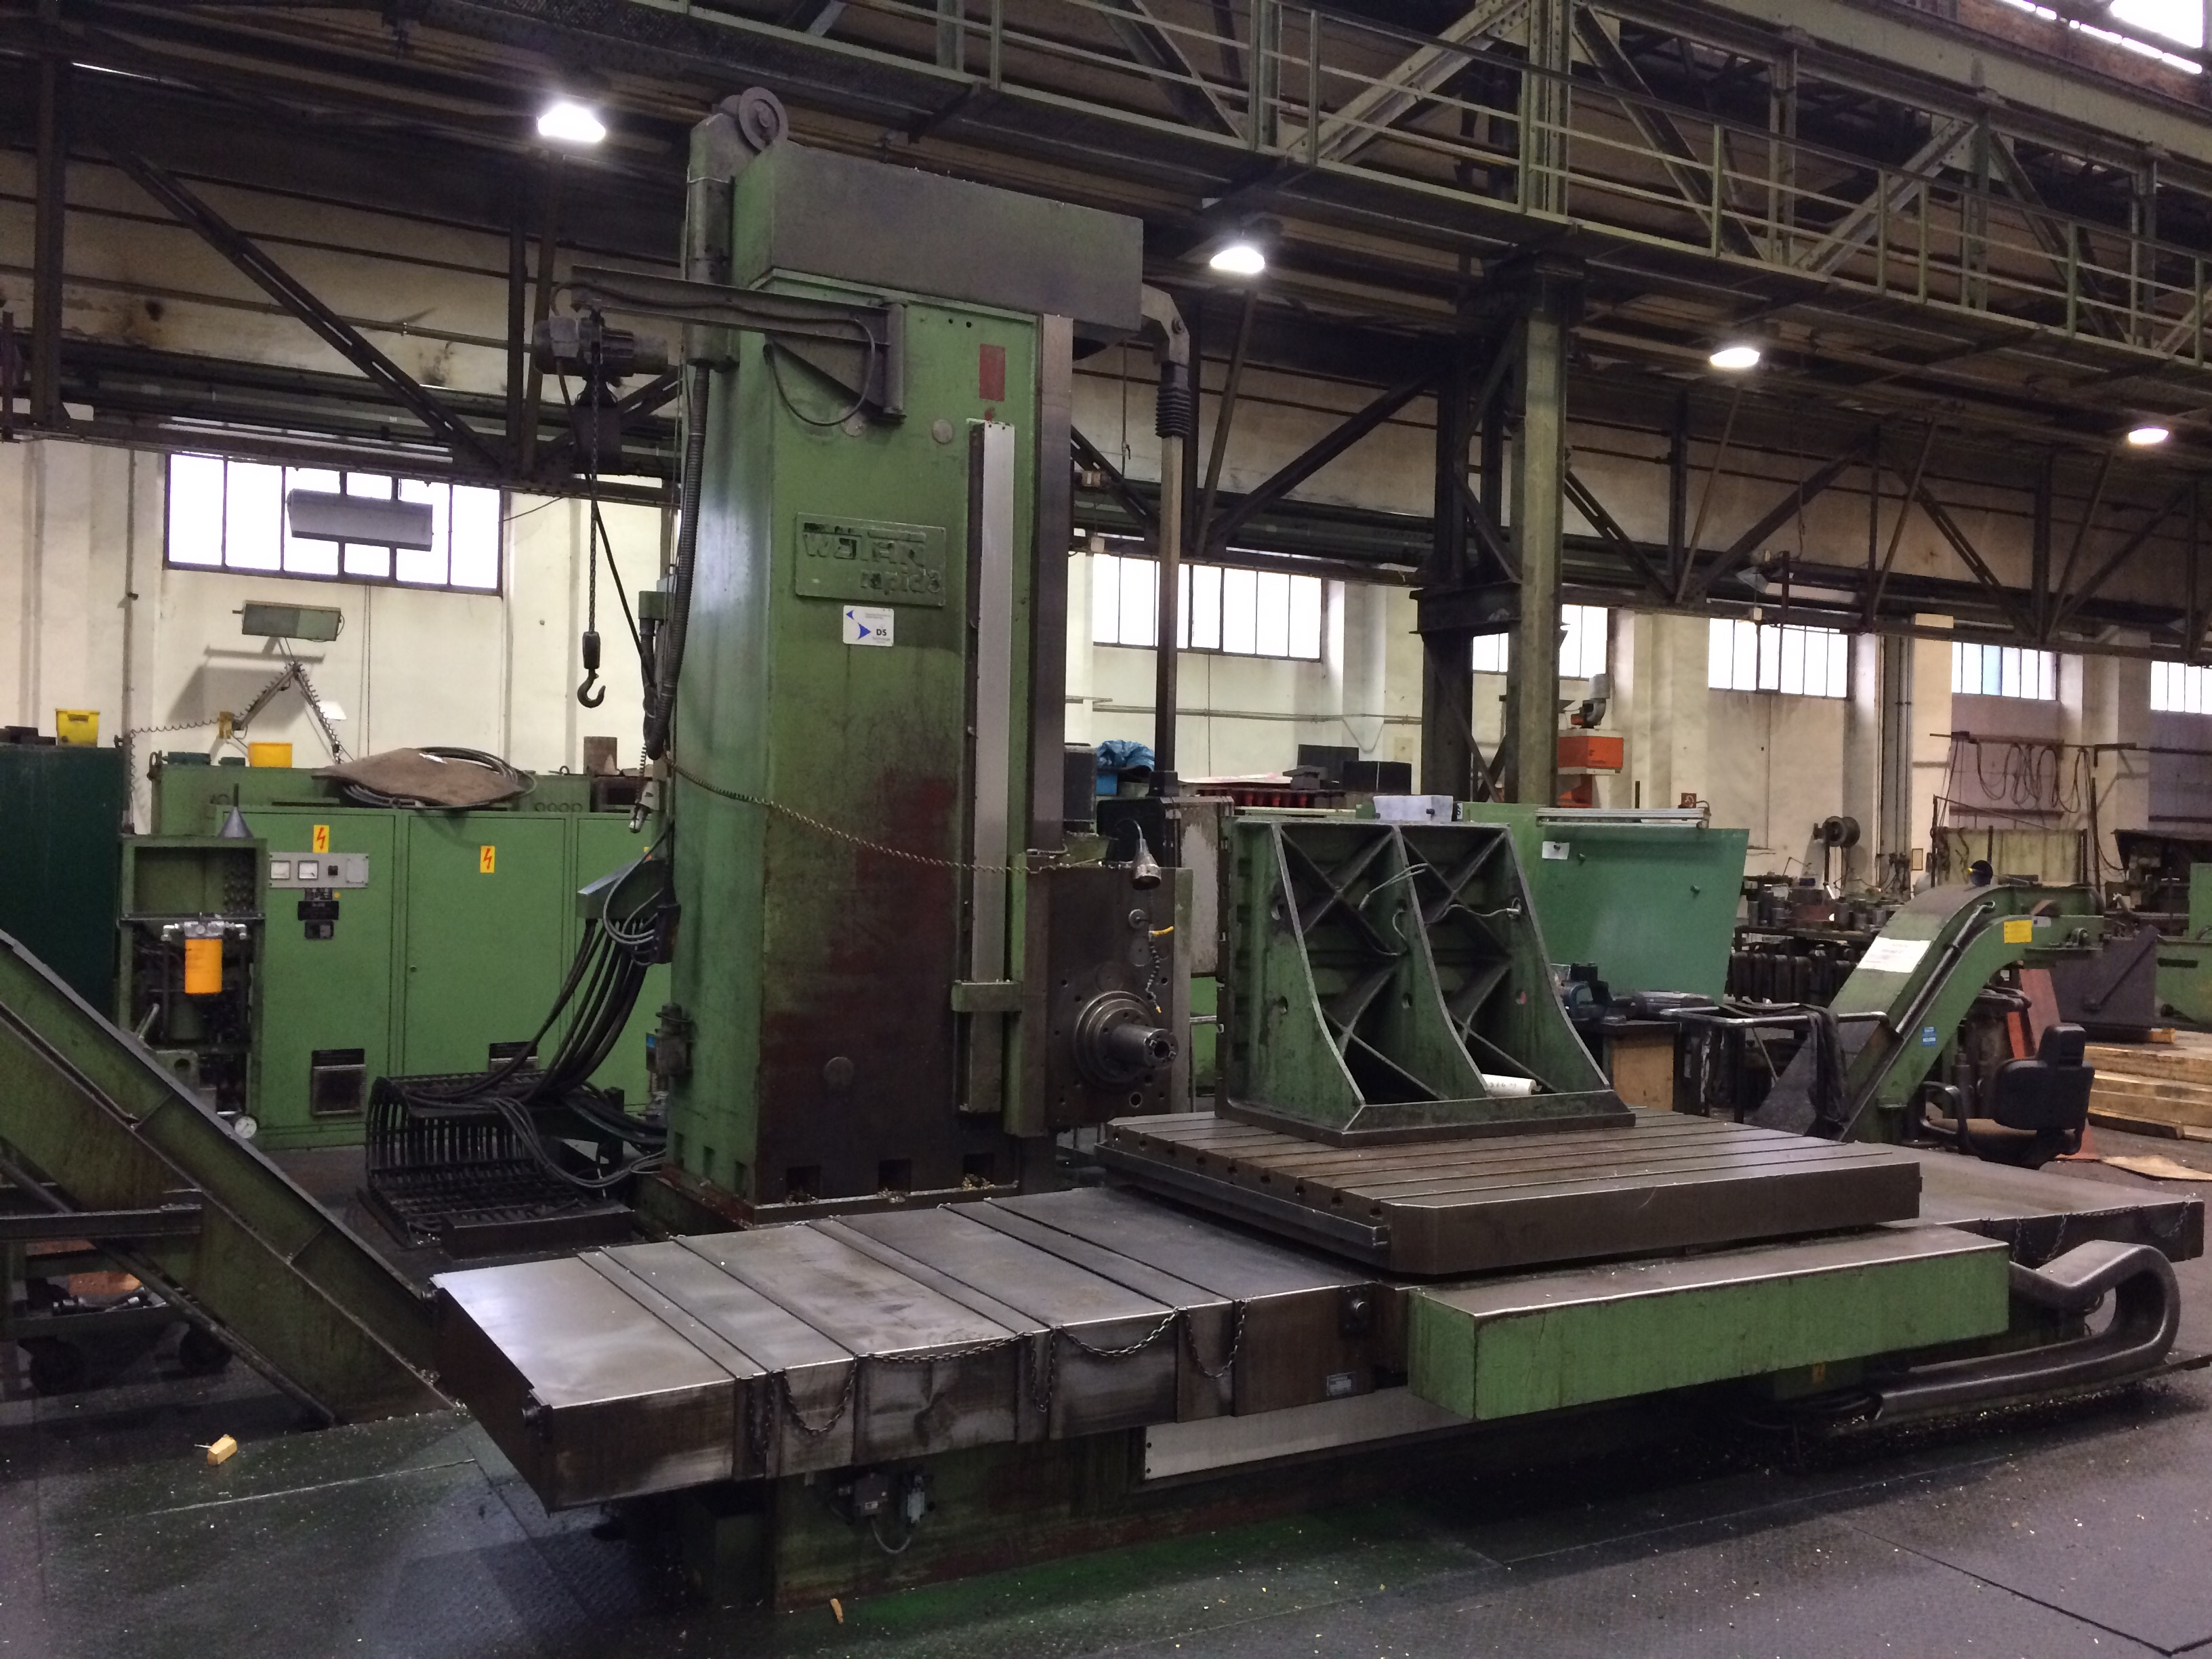 CNC Plattenbohrwerk, Fabr. WOTAN, Typ Rapid 3